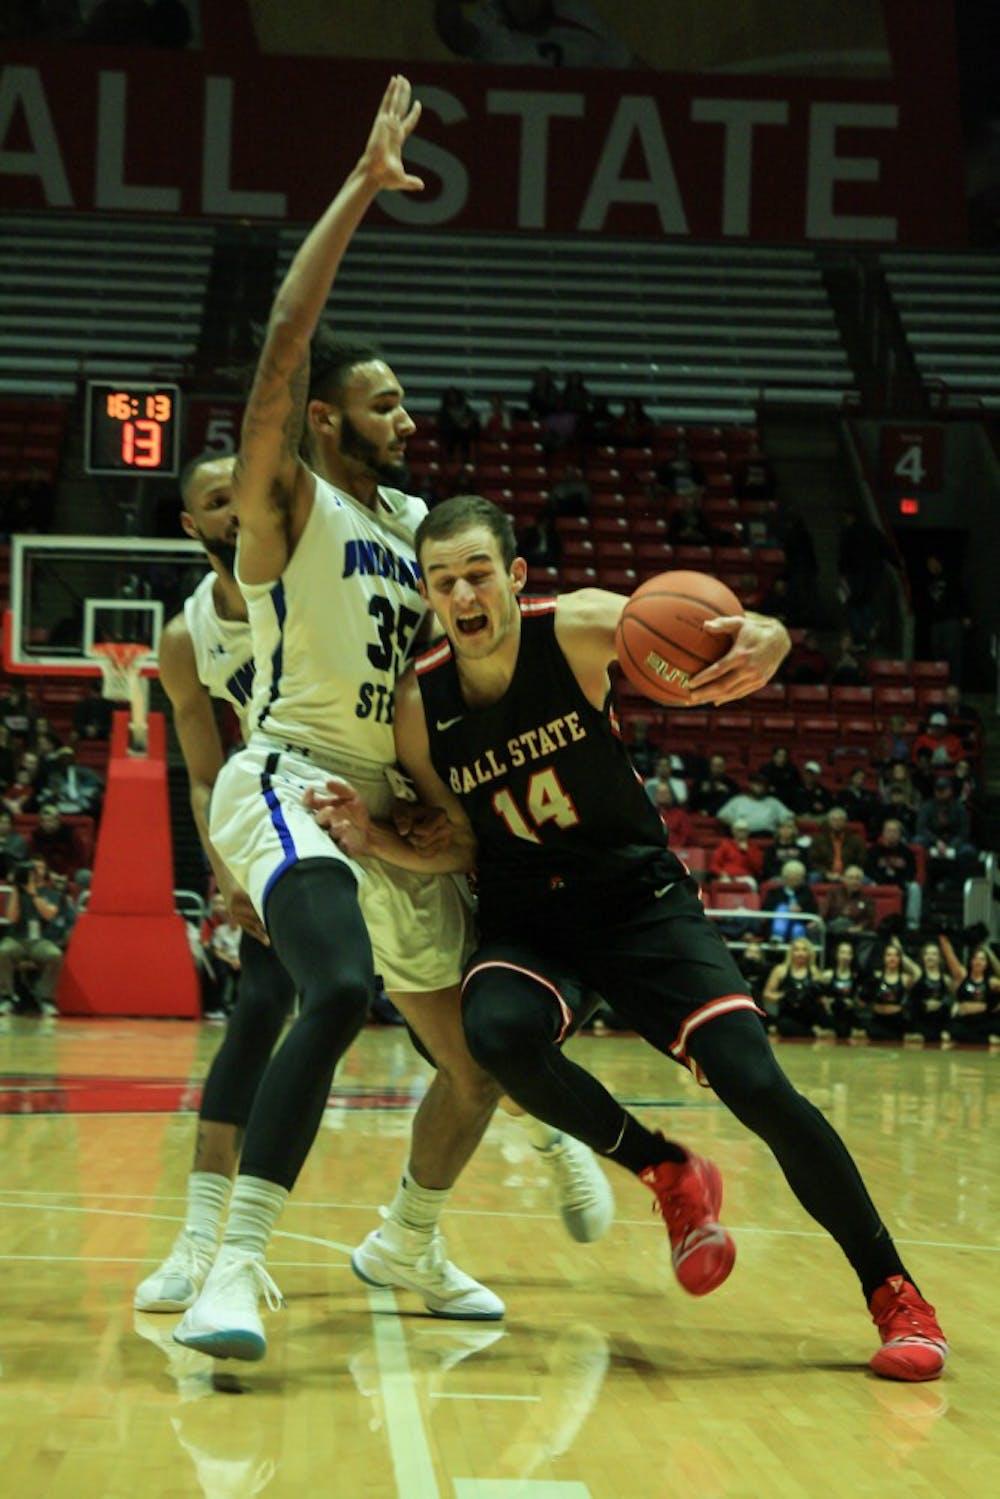 Long scoring runs prove too much as Ball State Men's Basketball falls to No. 16 Virginia Tech